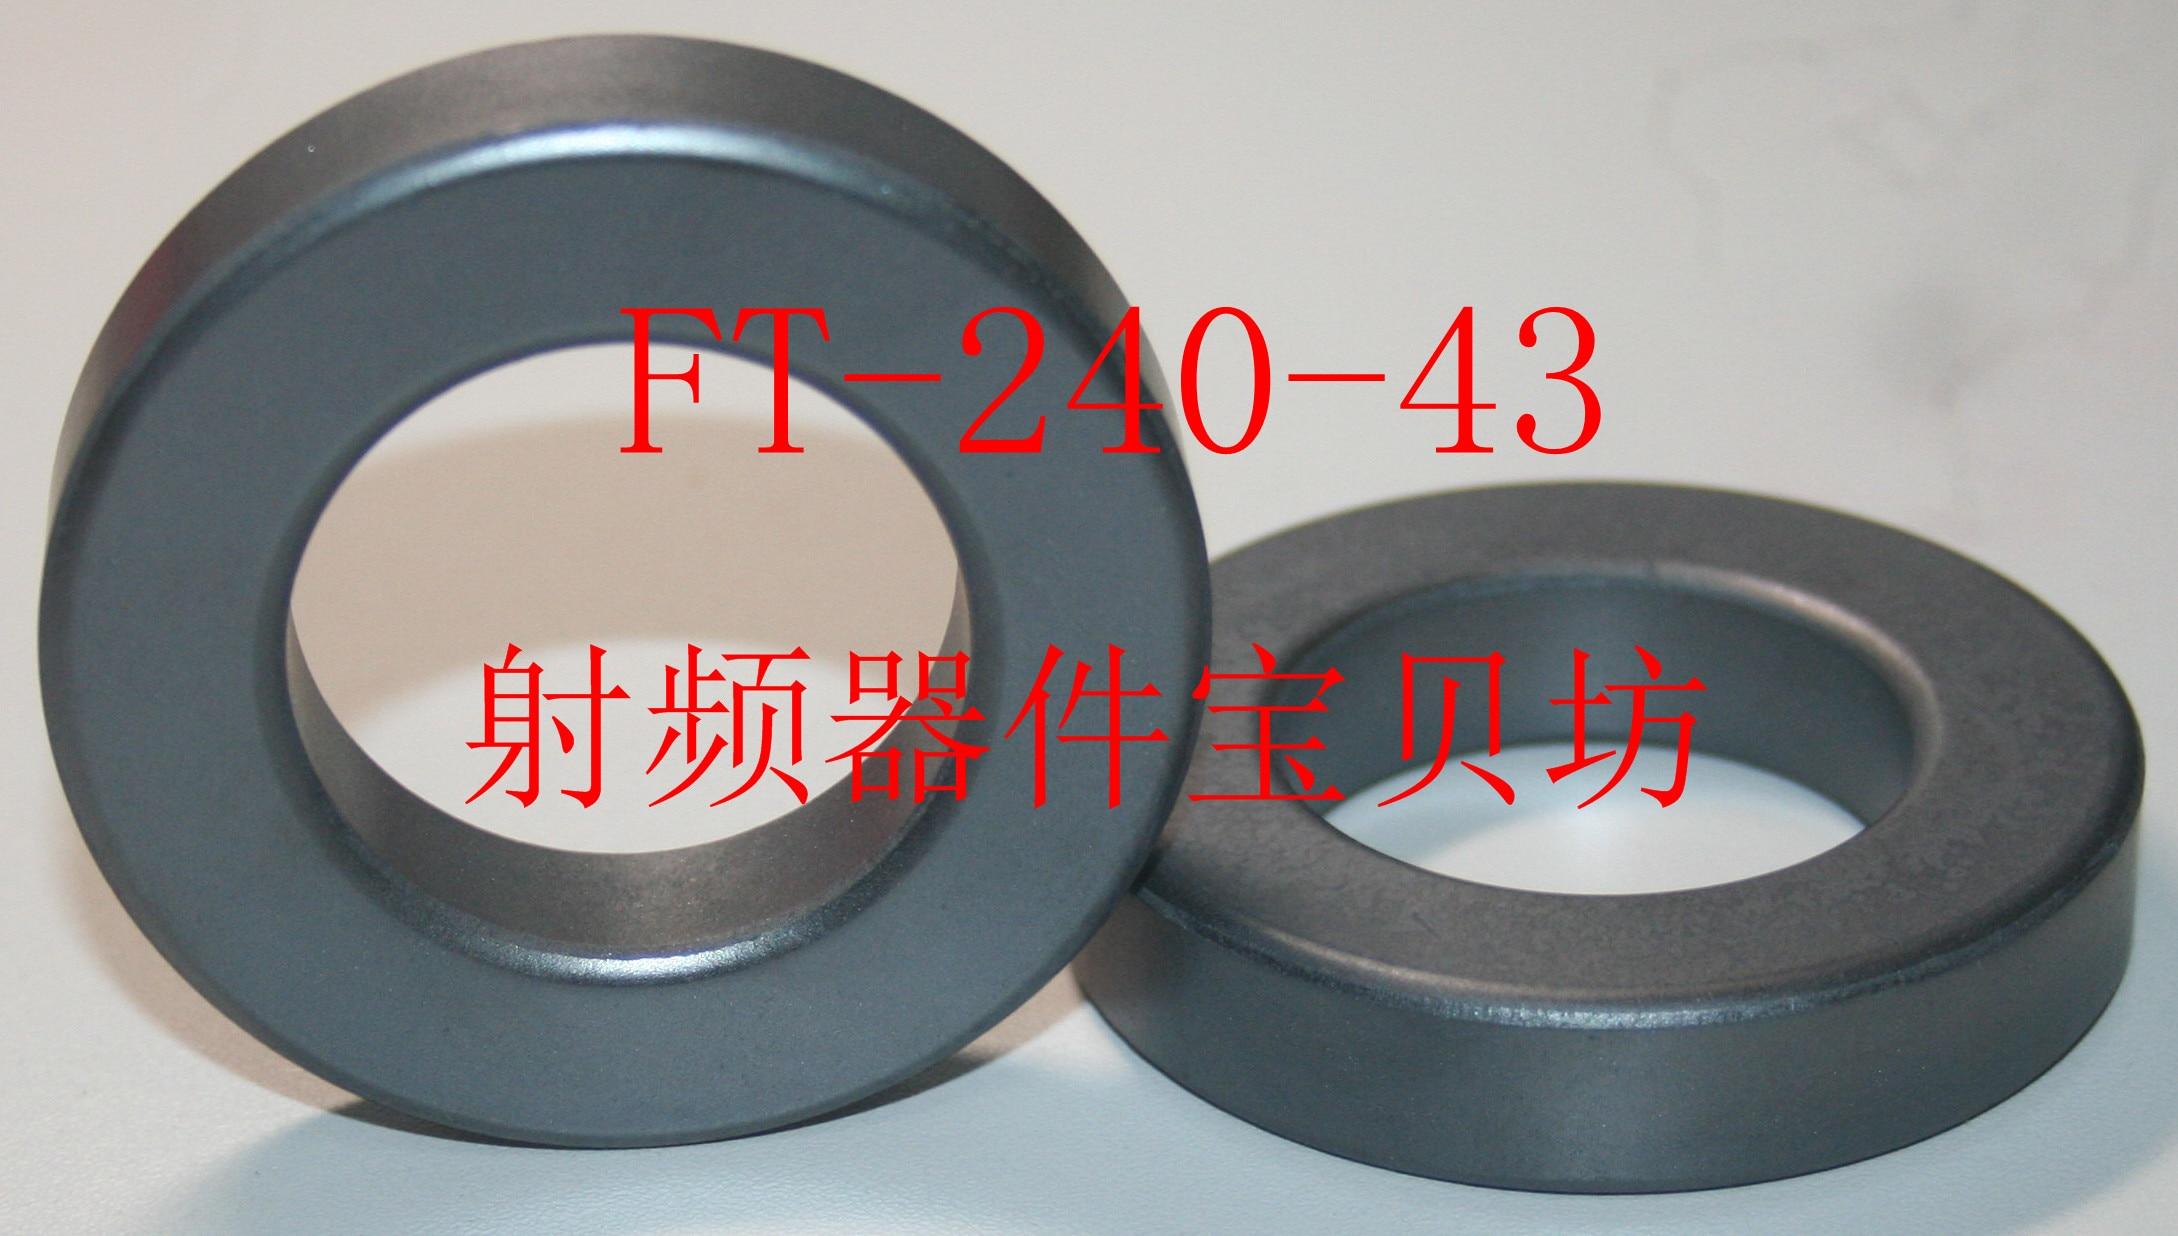 American RF Ferrite Core: FT-240-43